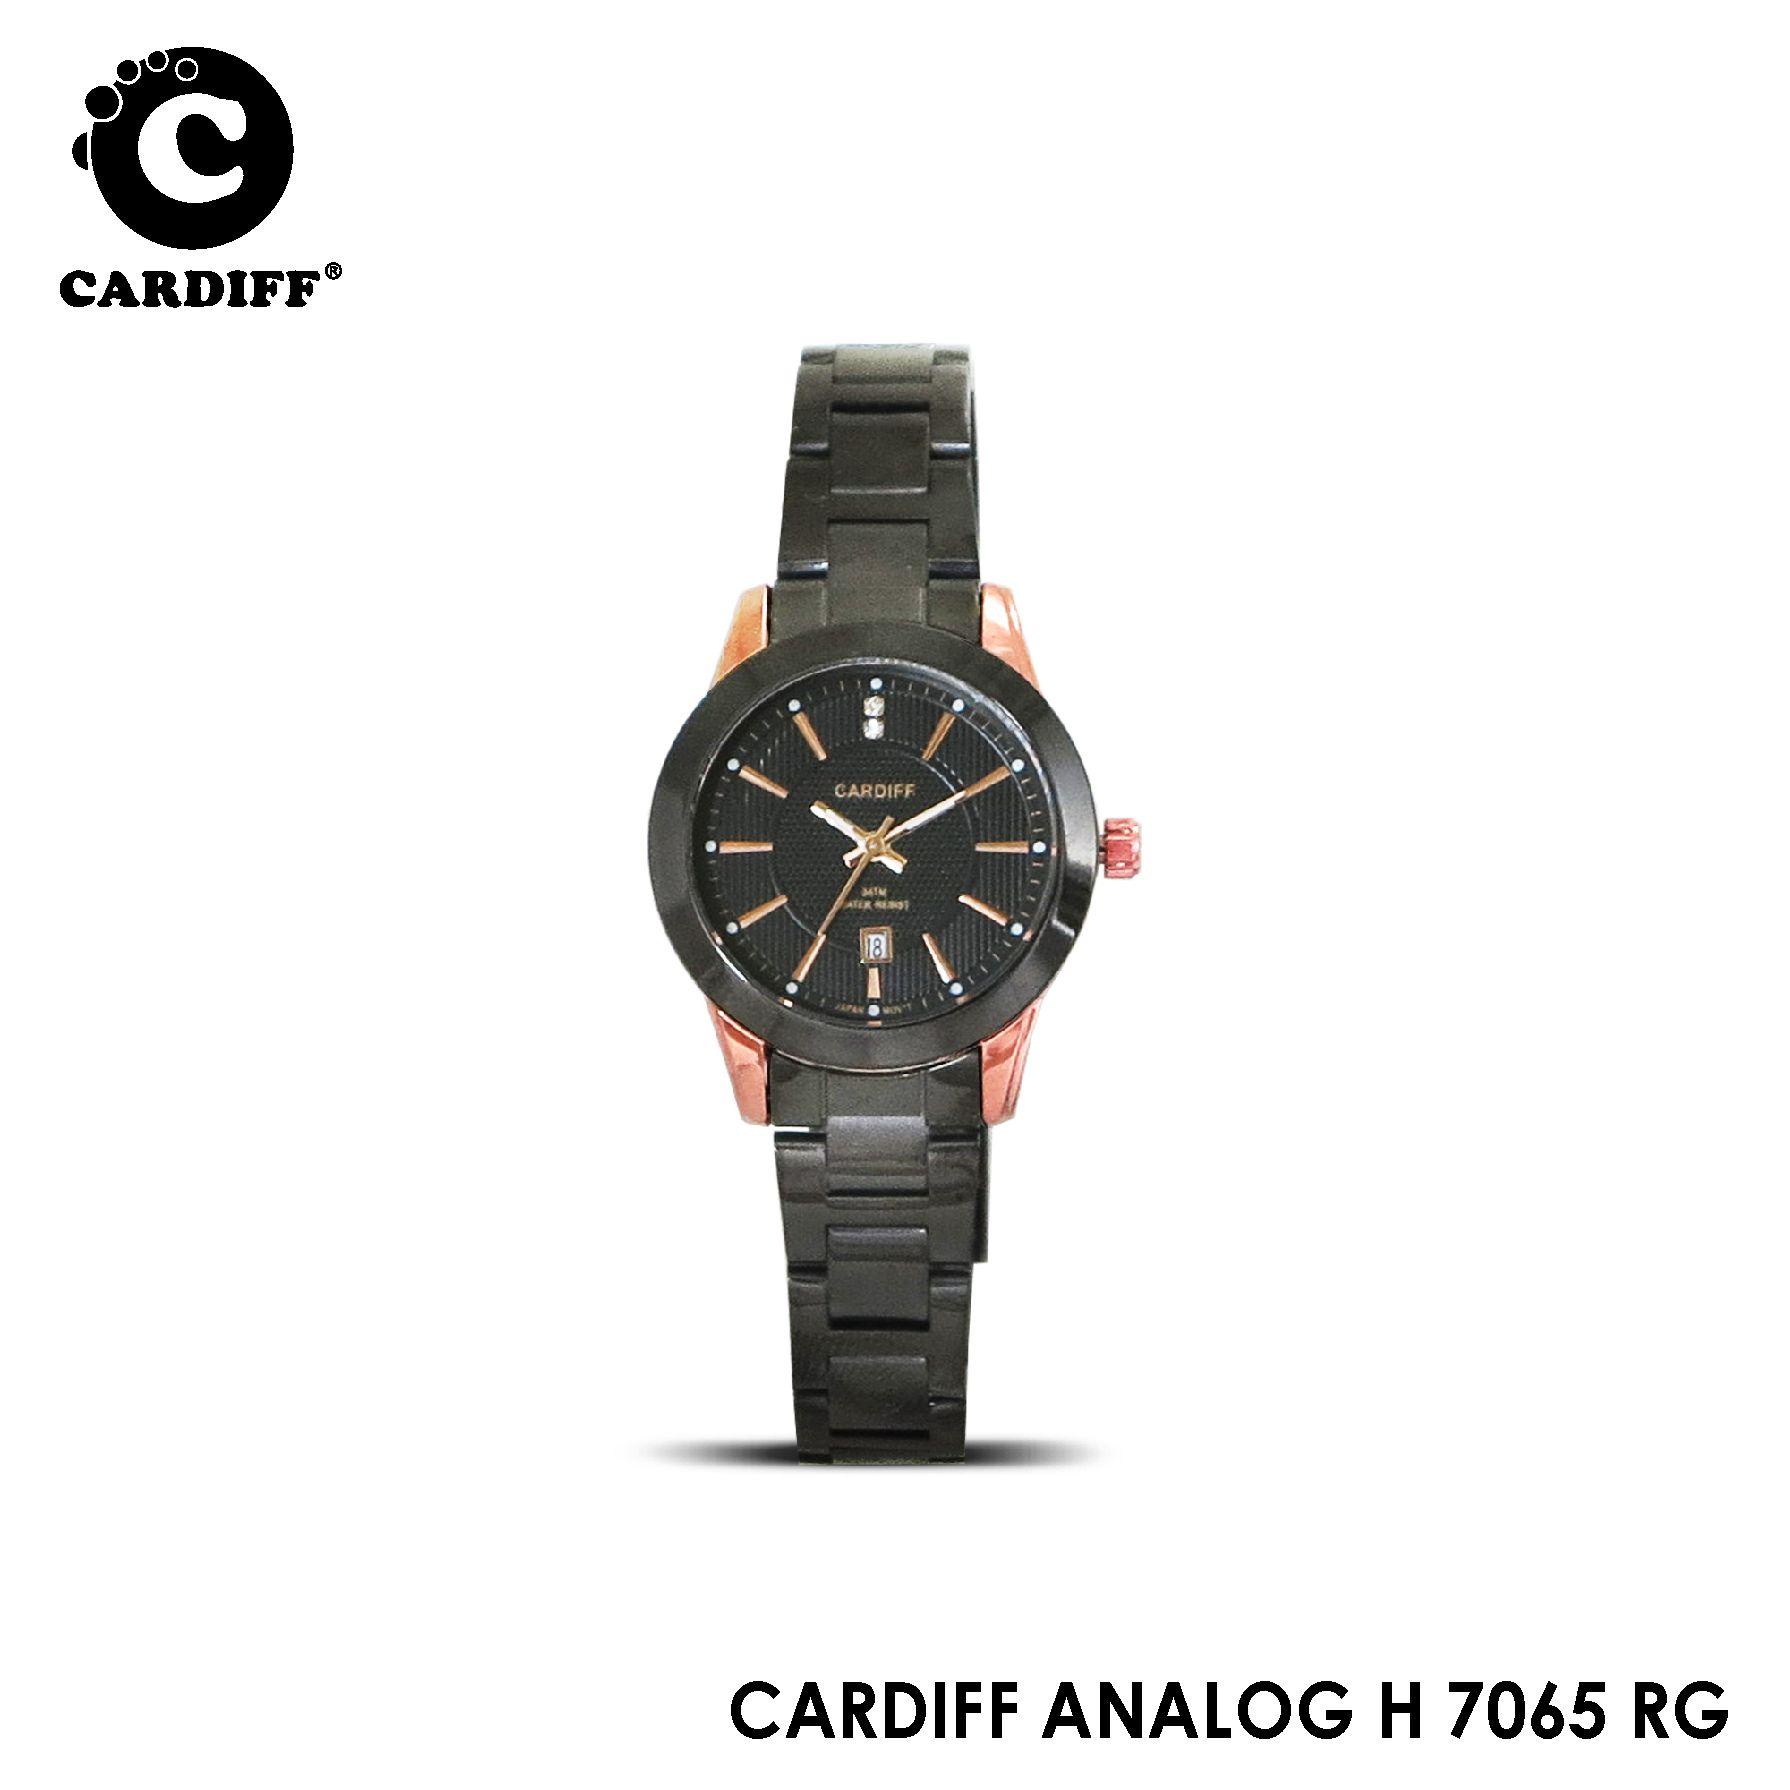 Cardiff Analog H 7065